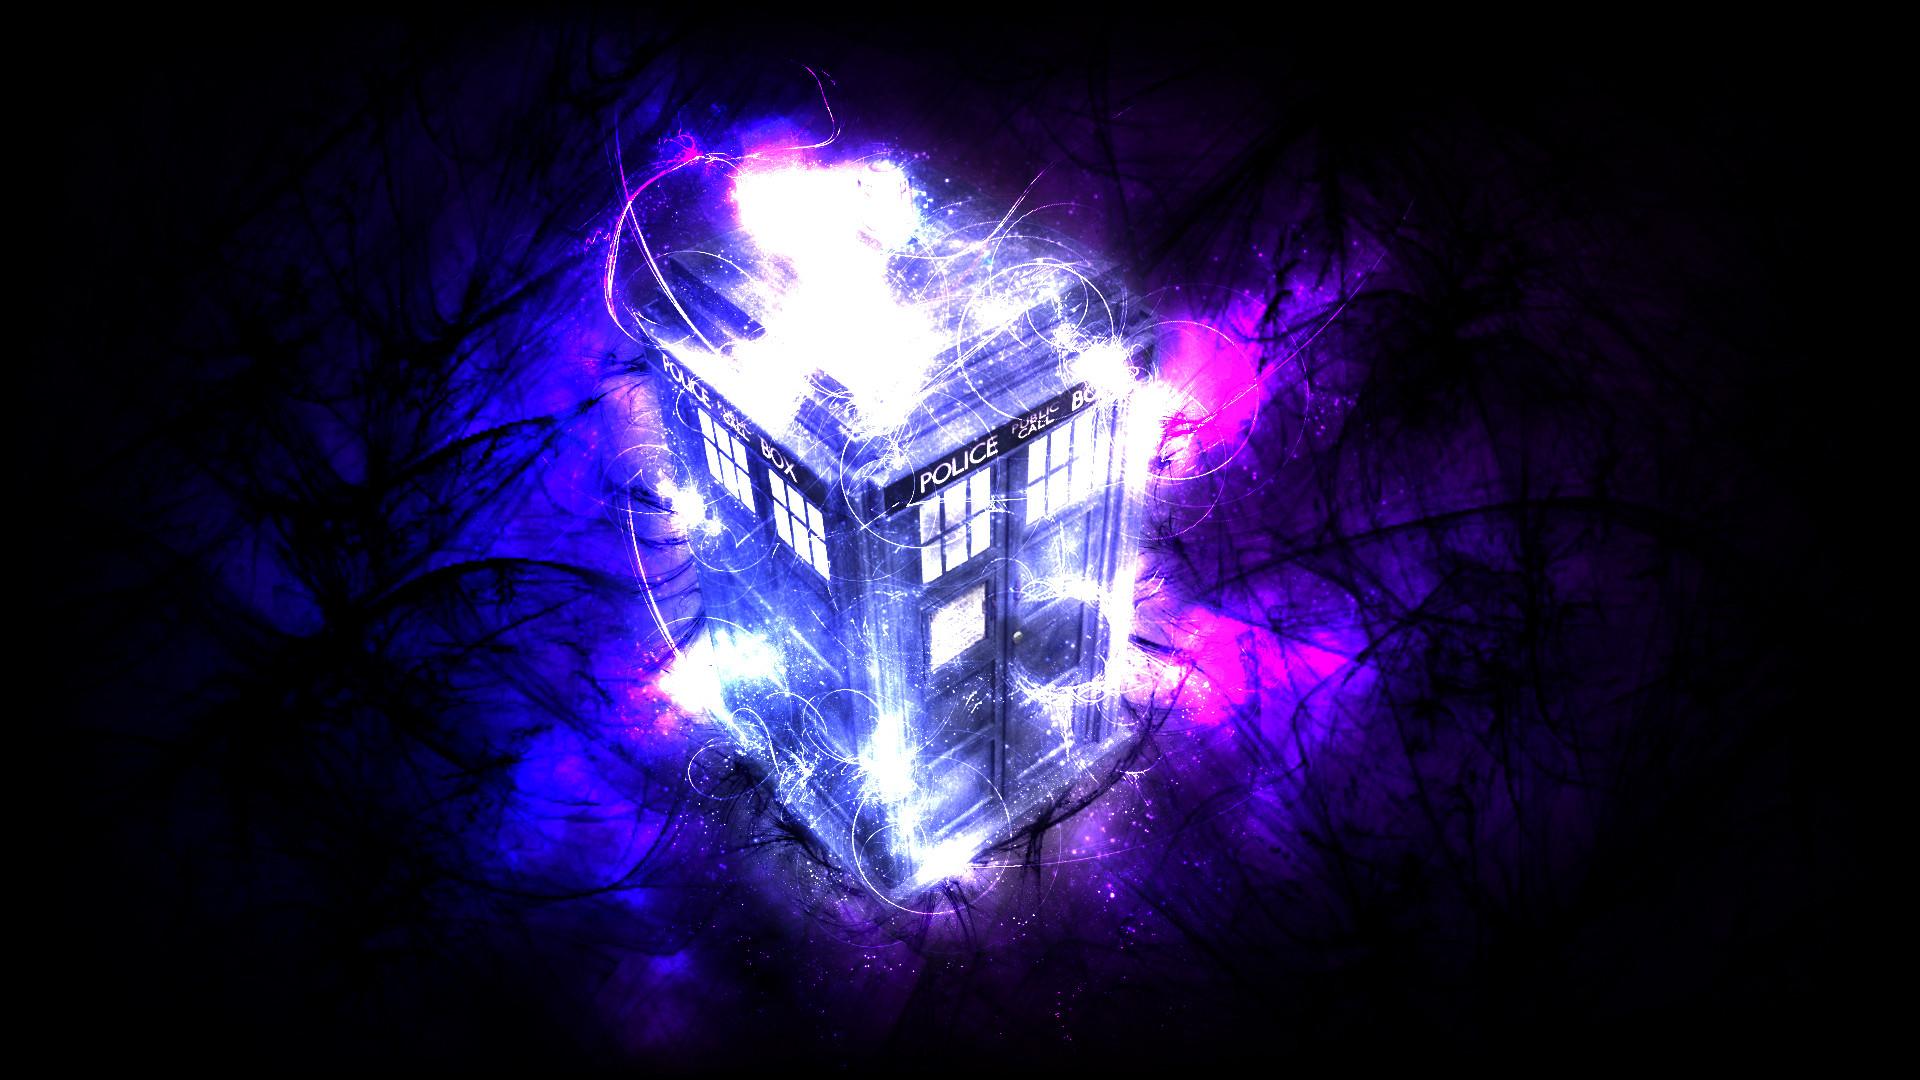 Doctor Who Tardis Matt Smith Desktop Hd Wallpaper CloudPix   HD Wallpapers    Pinterest   Matt smith, Hd wallpaper and Wallpaper